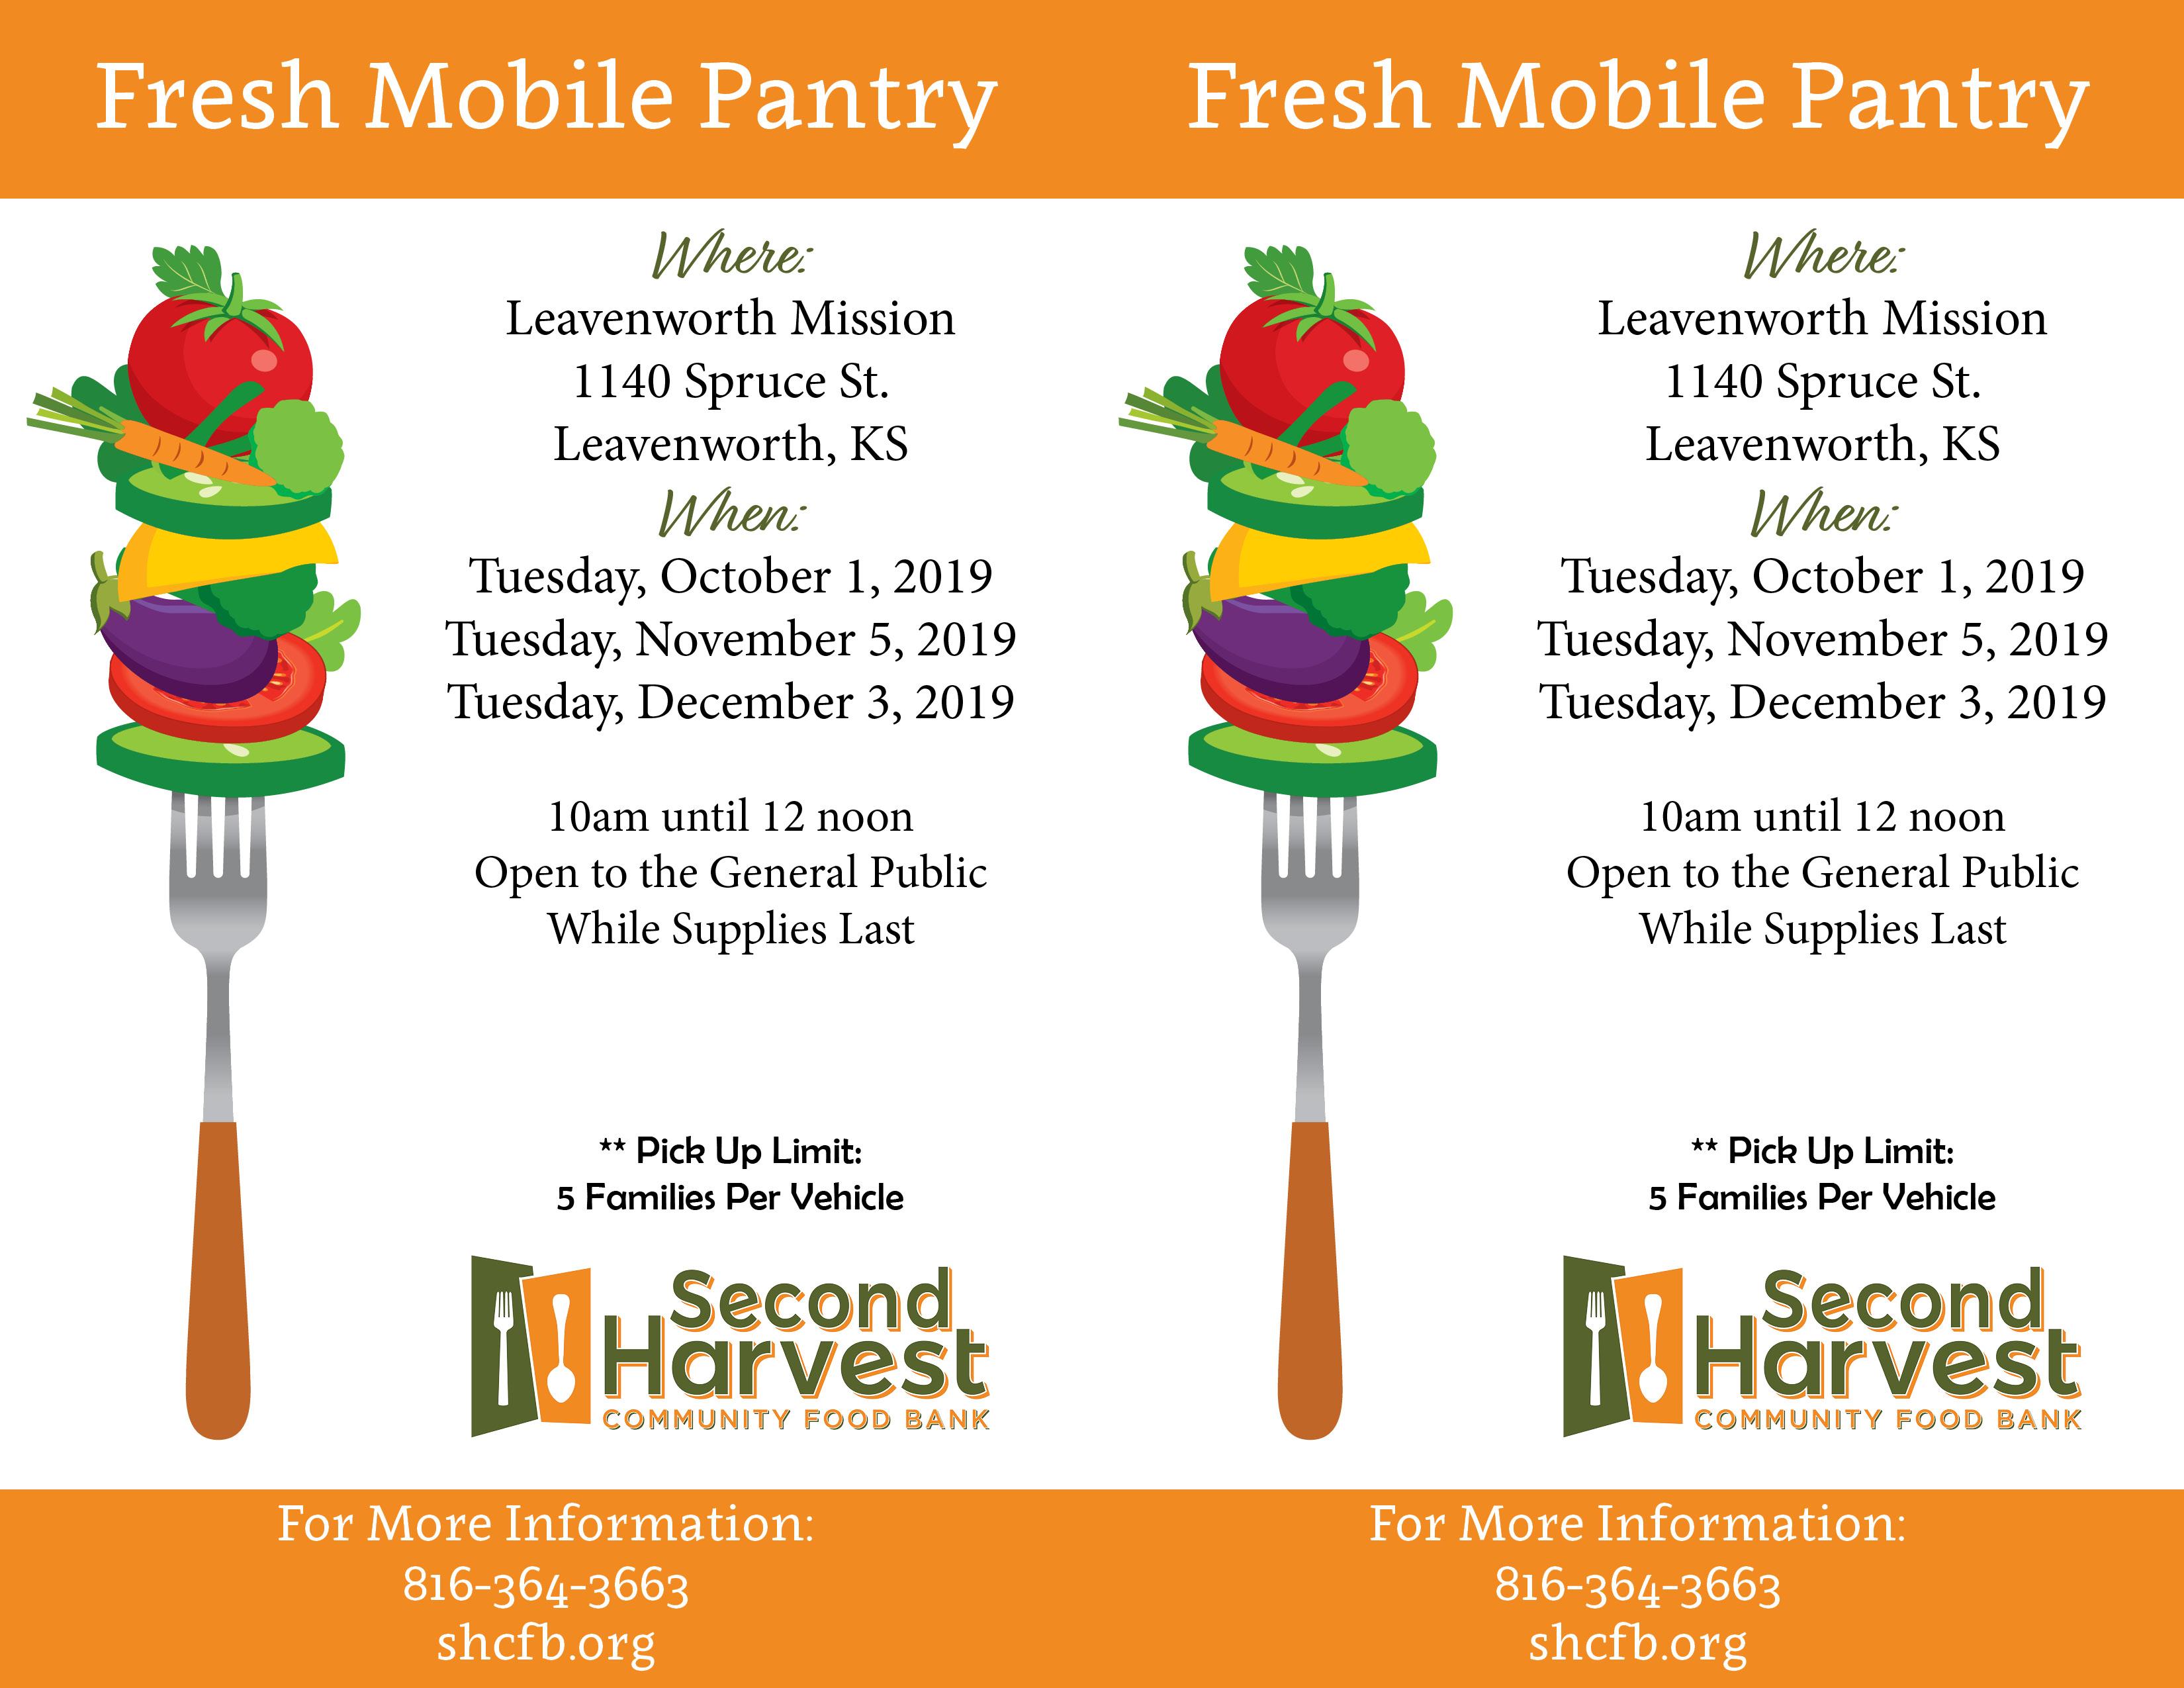 Leavenworth Mission Fresh Mobile Pantry